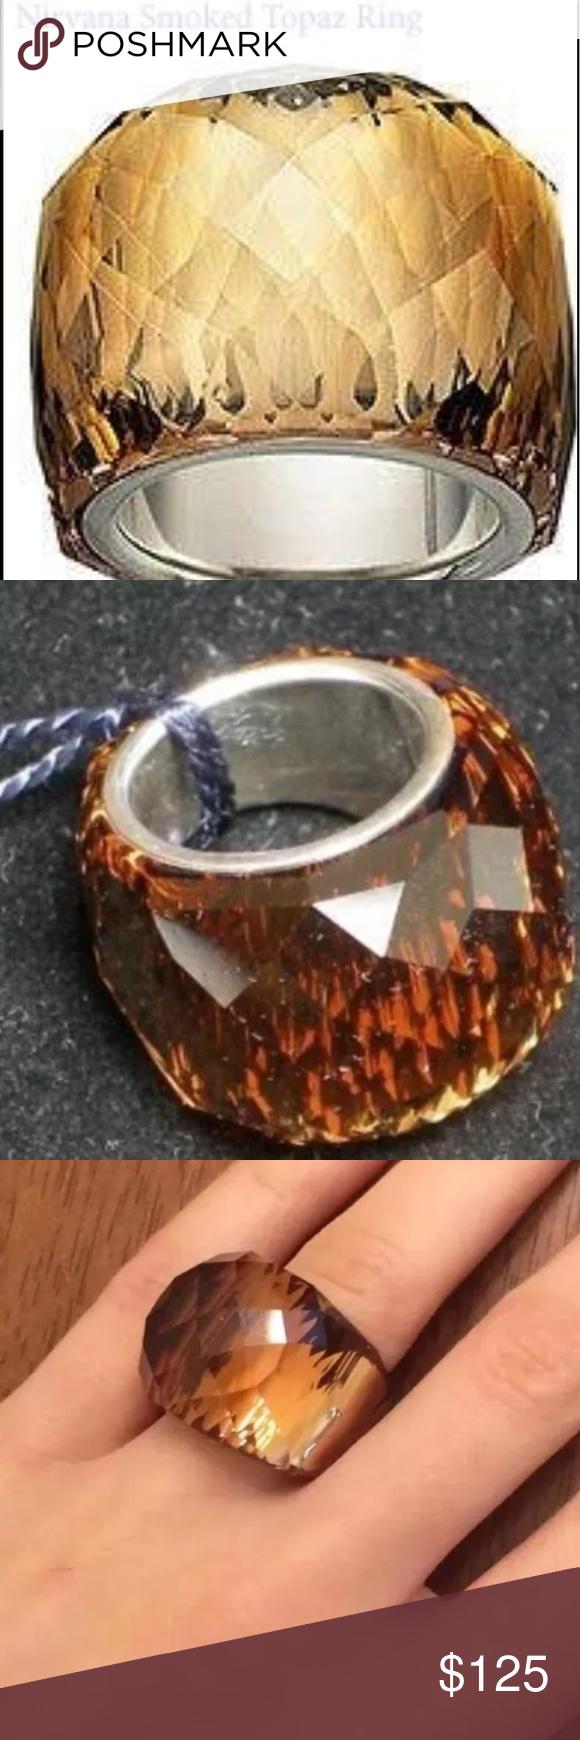 4f50b9db4b4b  190 SWAROVSKI Smoked Topaz RARE Nirvana Ring DANIEL SWAROVKSI Smoked Topaz  Crystal Nirvana Ring Size 50 Super Rare! Retired! This ring is brand new  and in ...